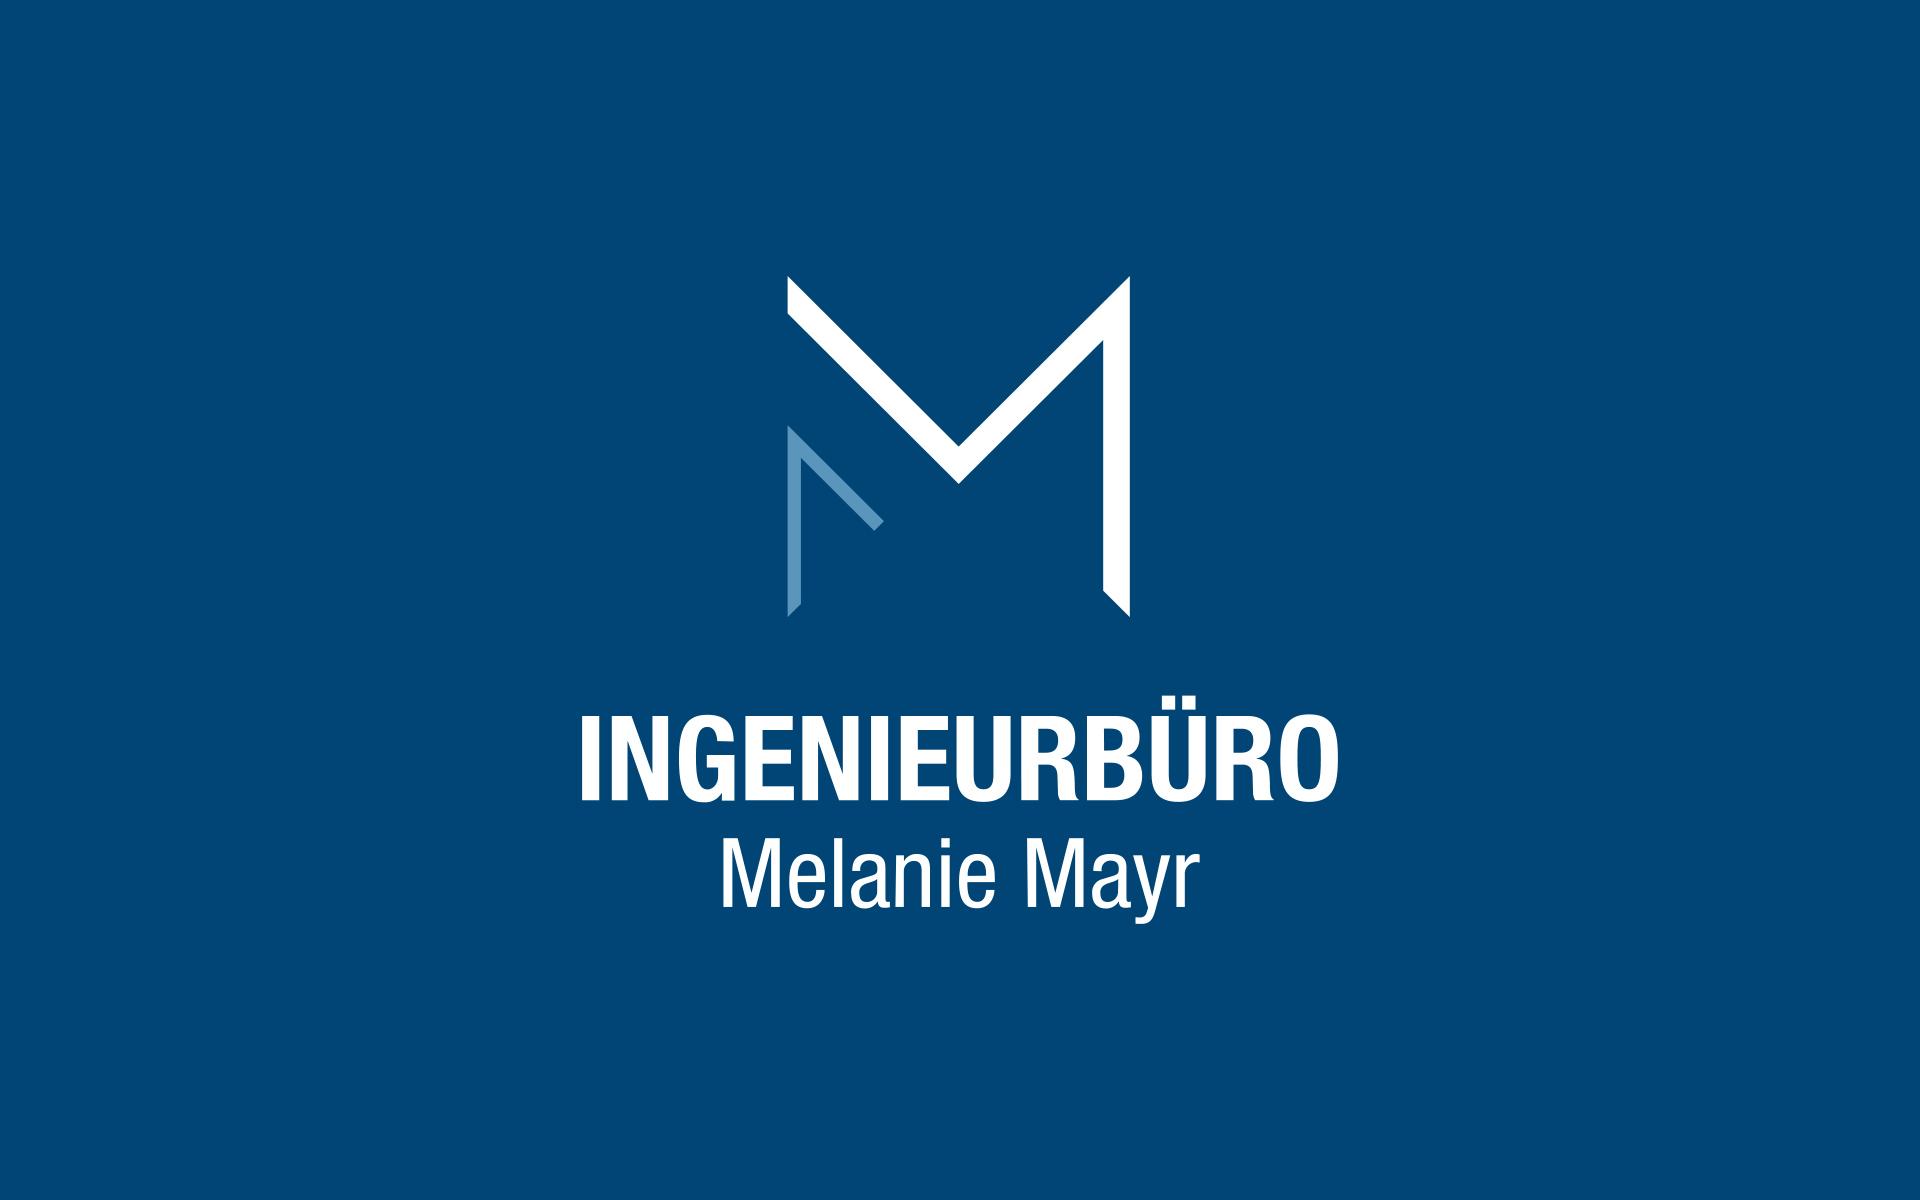 maxfath-ingenieurbuero-melanie-mayr-mering-branding-logo-vertikal-weiss